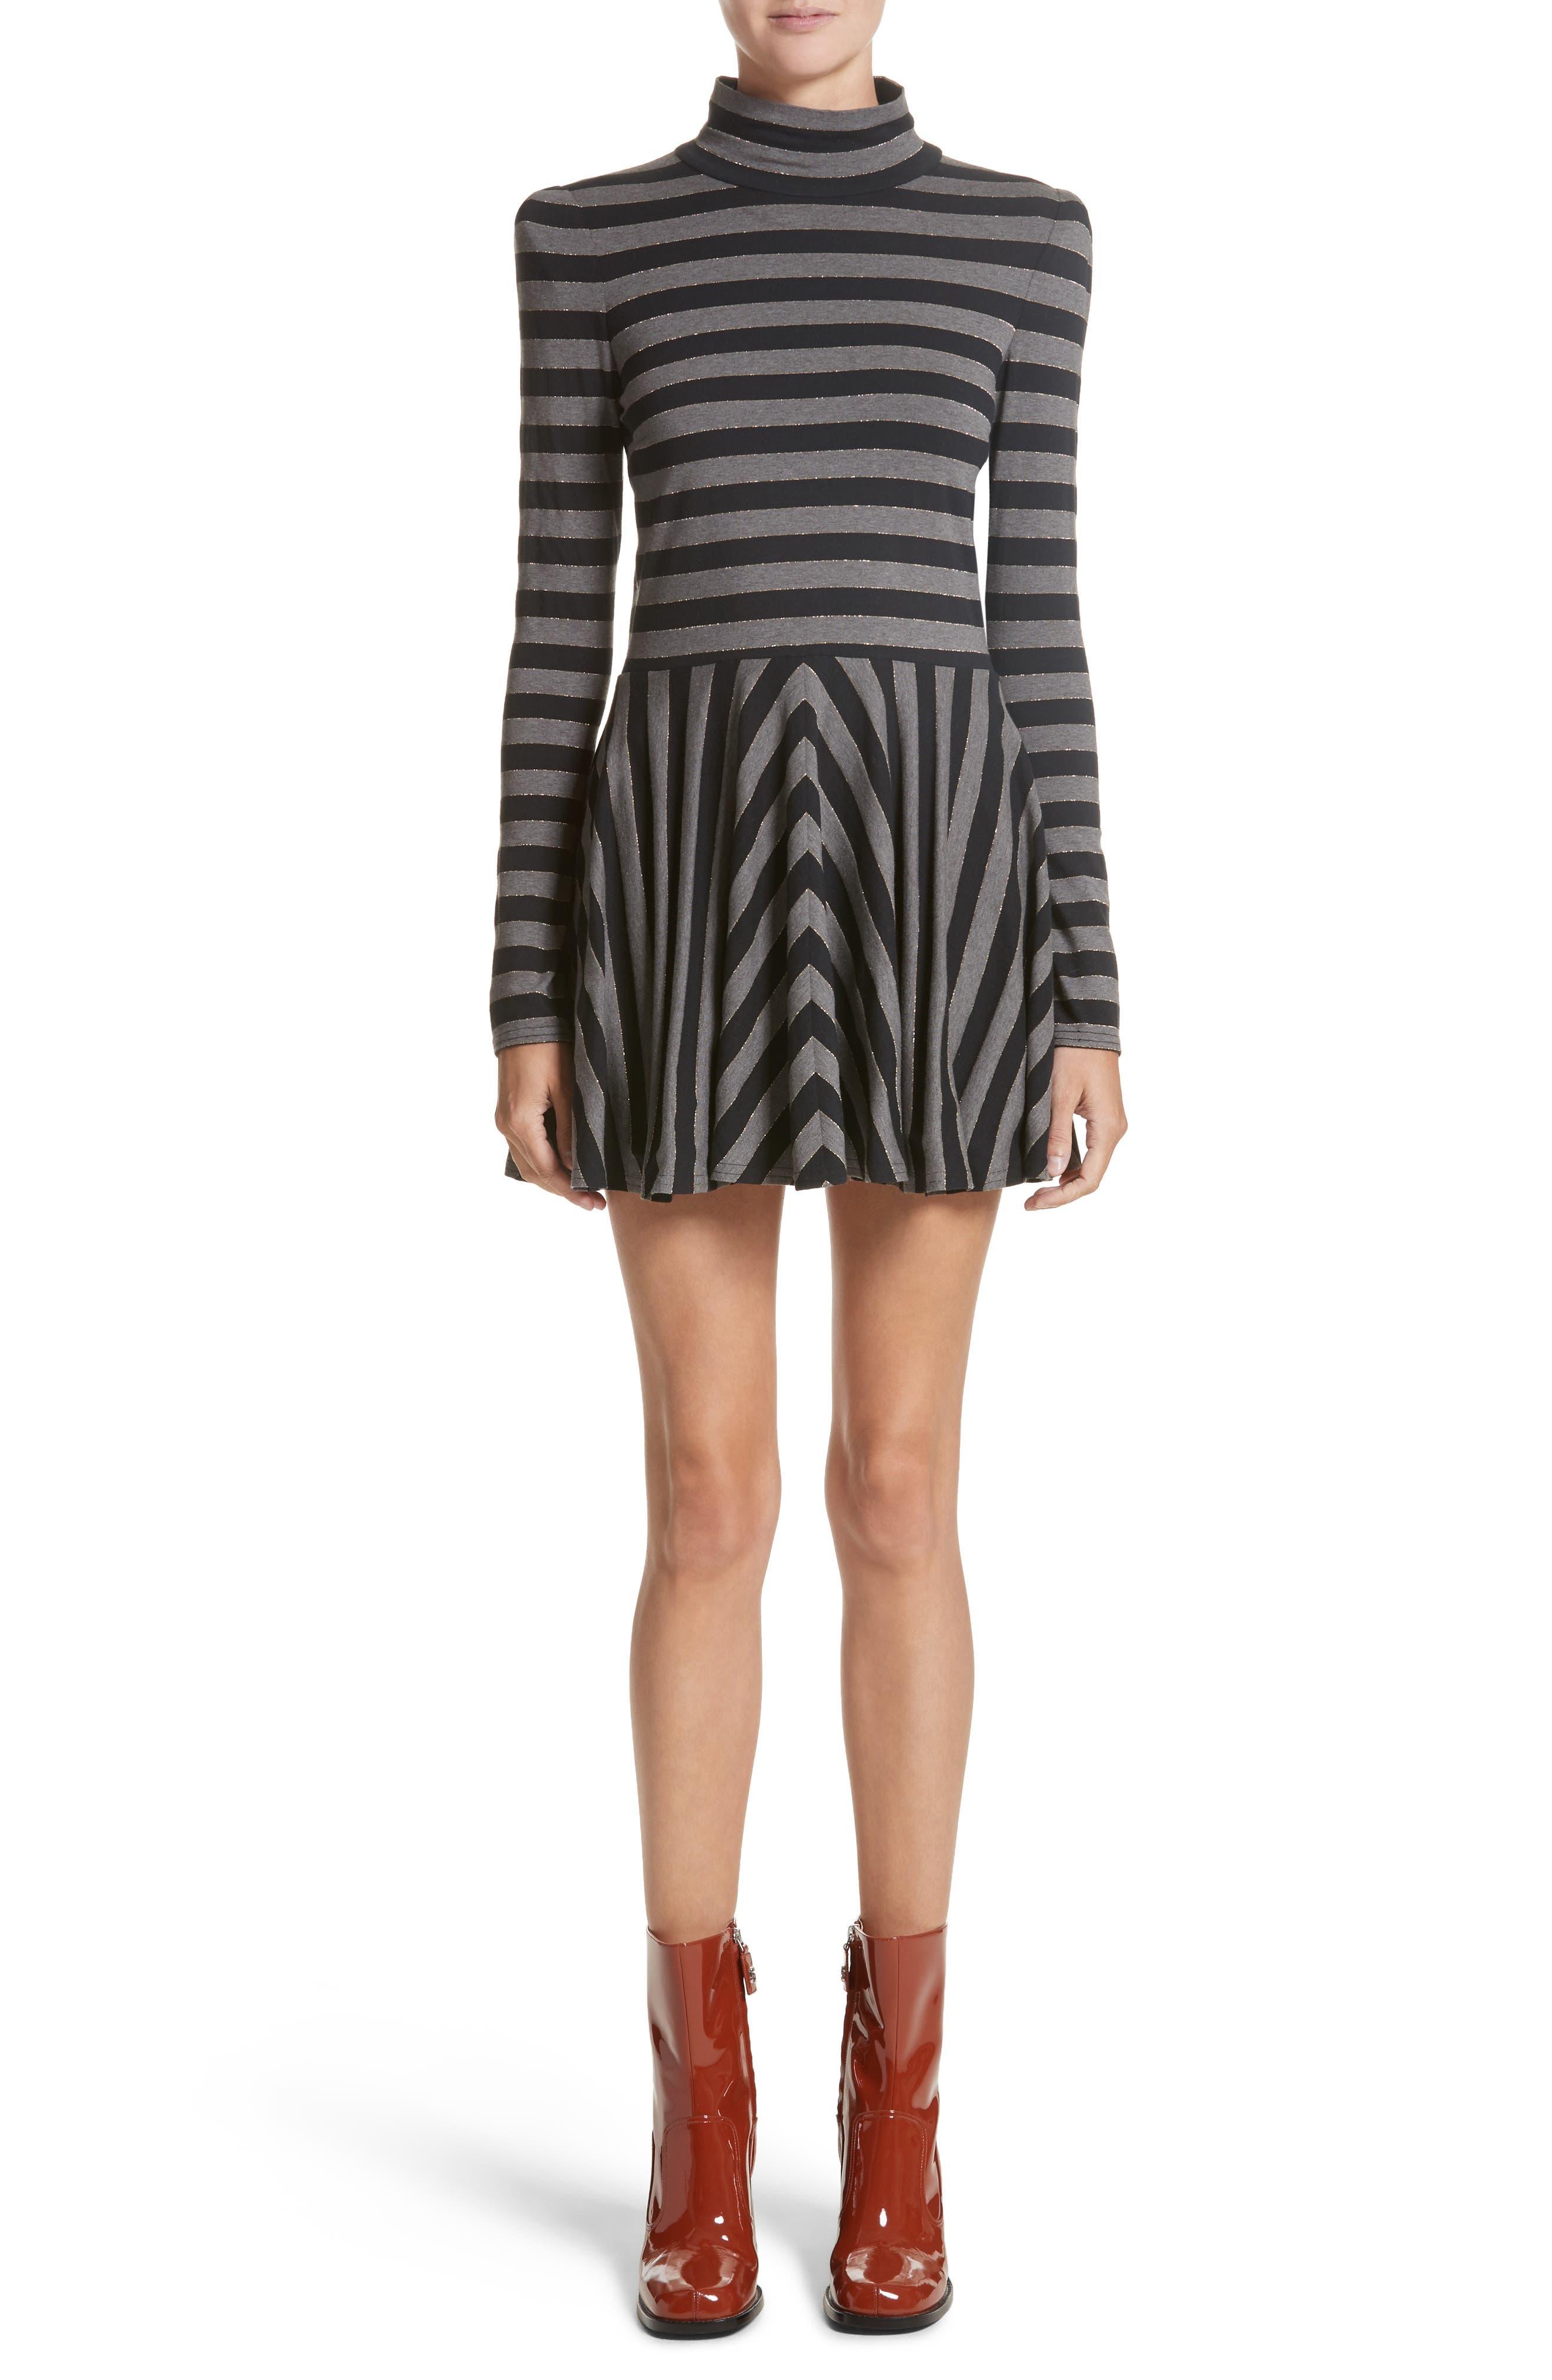 MARC JACOBS Stripe Jersey Fit & Flare Dress